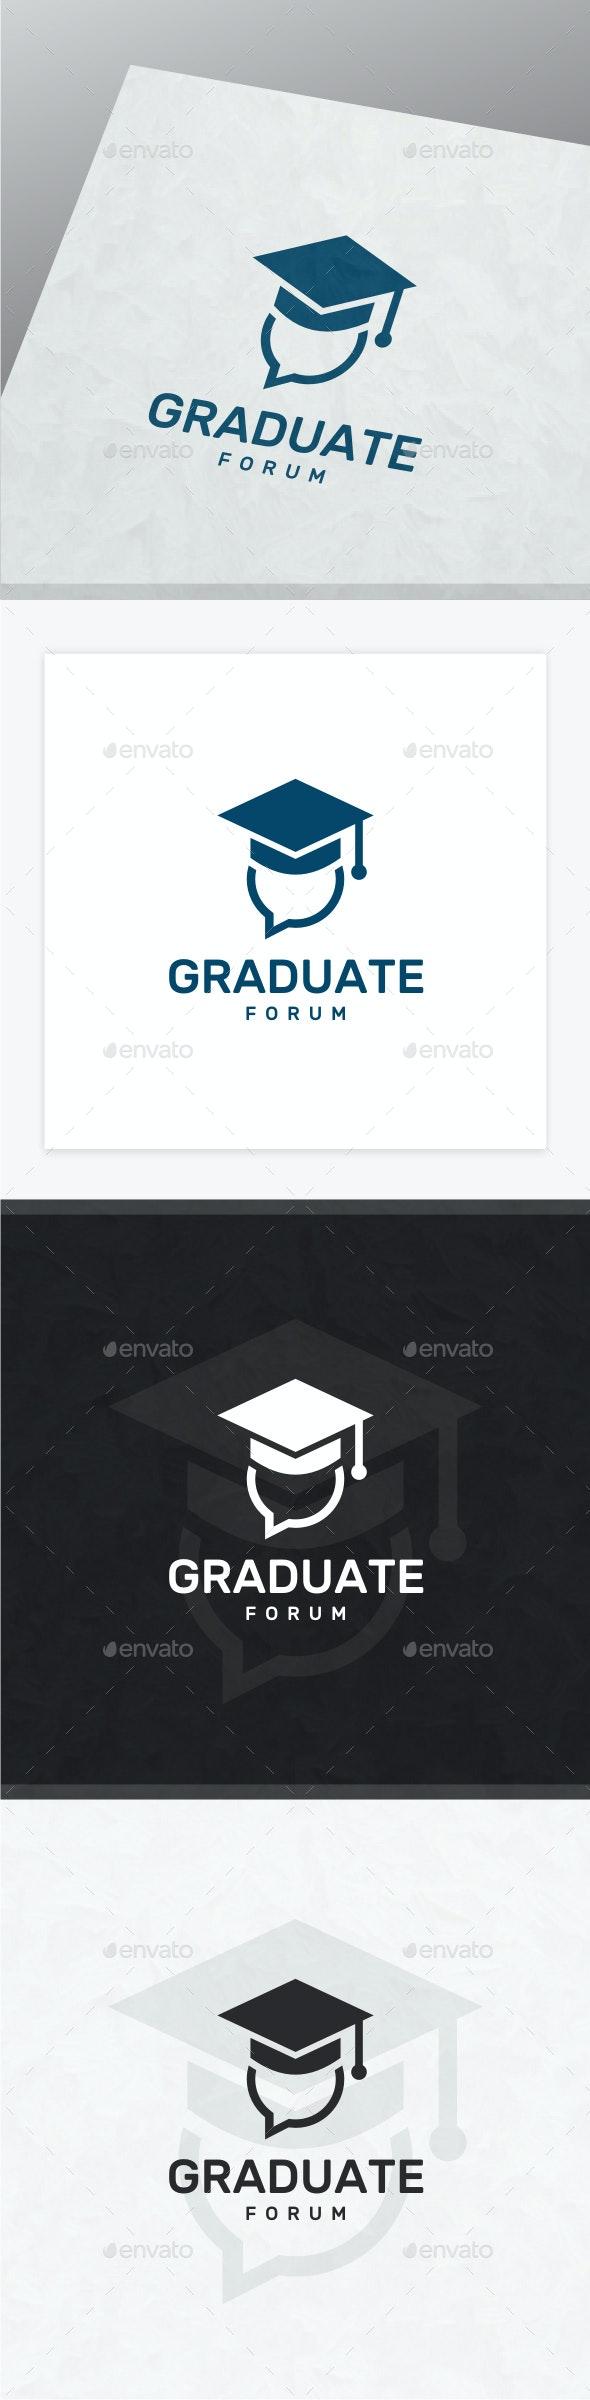 Graduate Logo - College Logo Templates